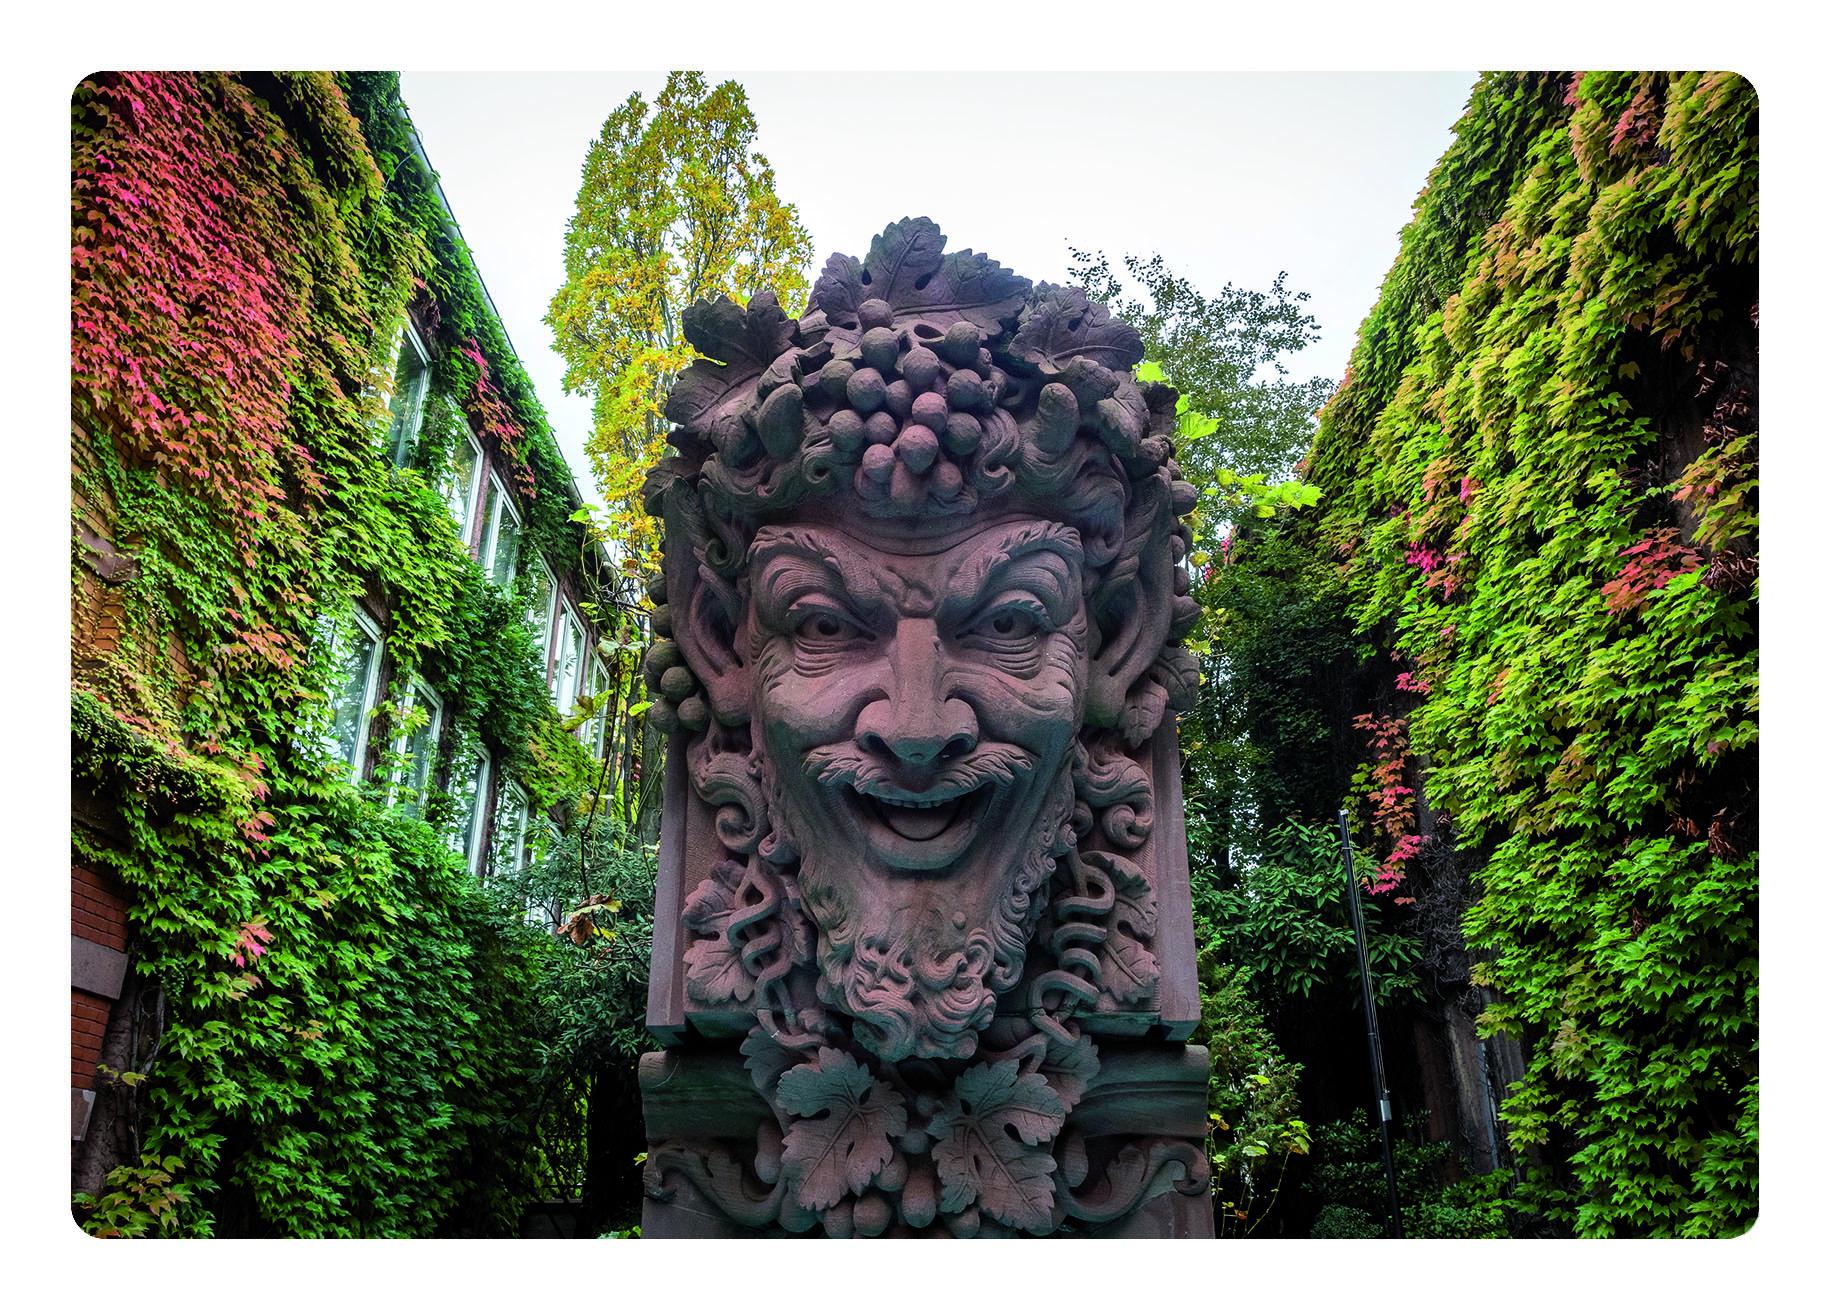 querformat-fotografie - Achim Katzberg - 03_1 Postkarten_Mainz_Bacchus